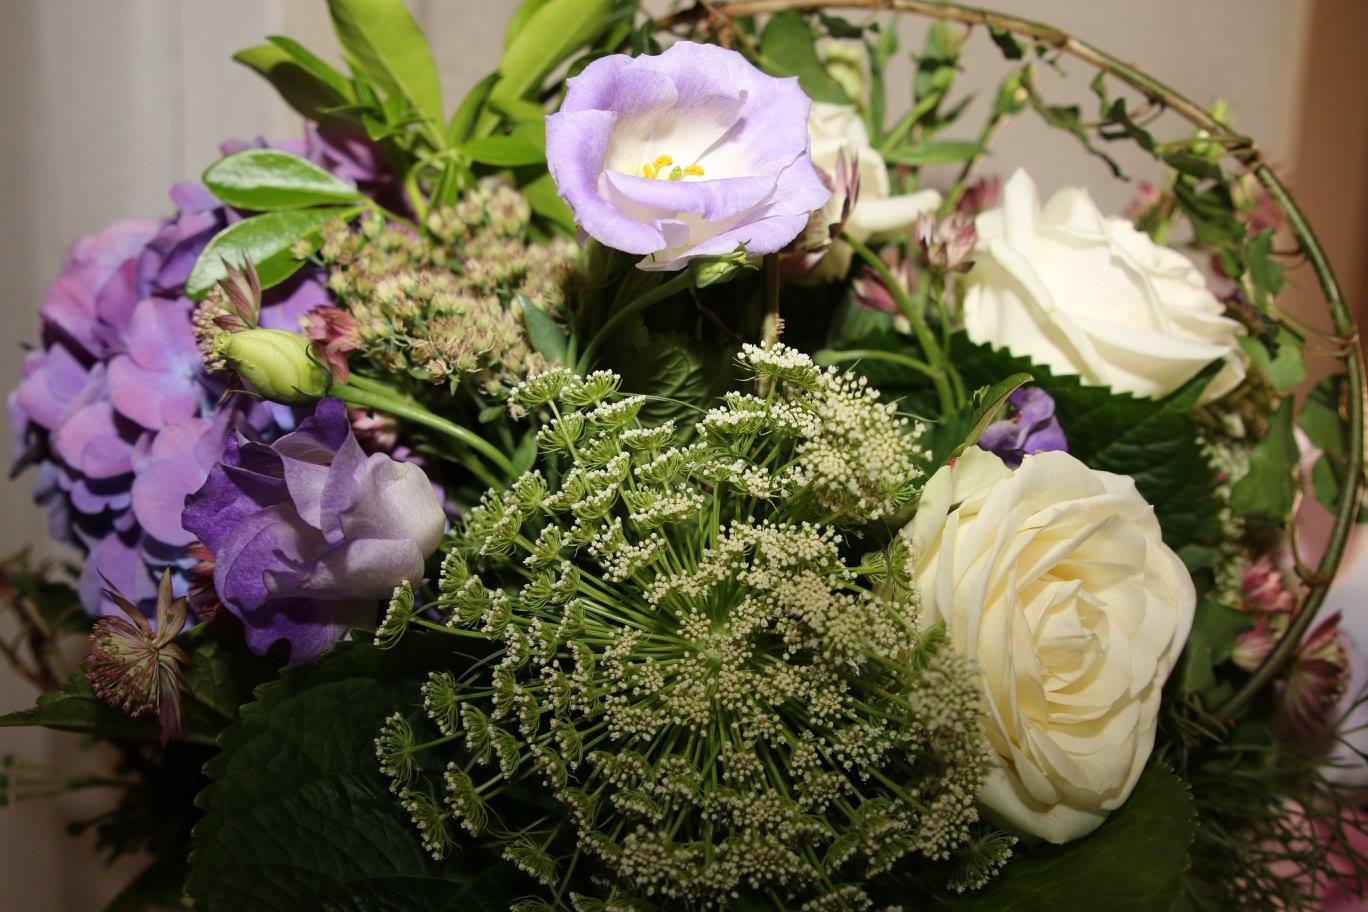 Galerie d'image - Or Végétal Fleuriste